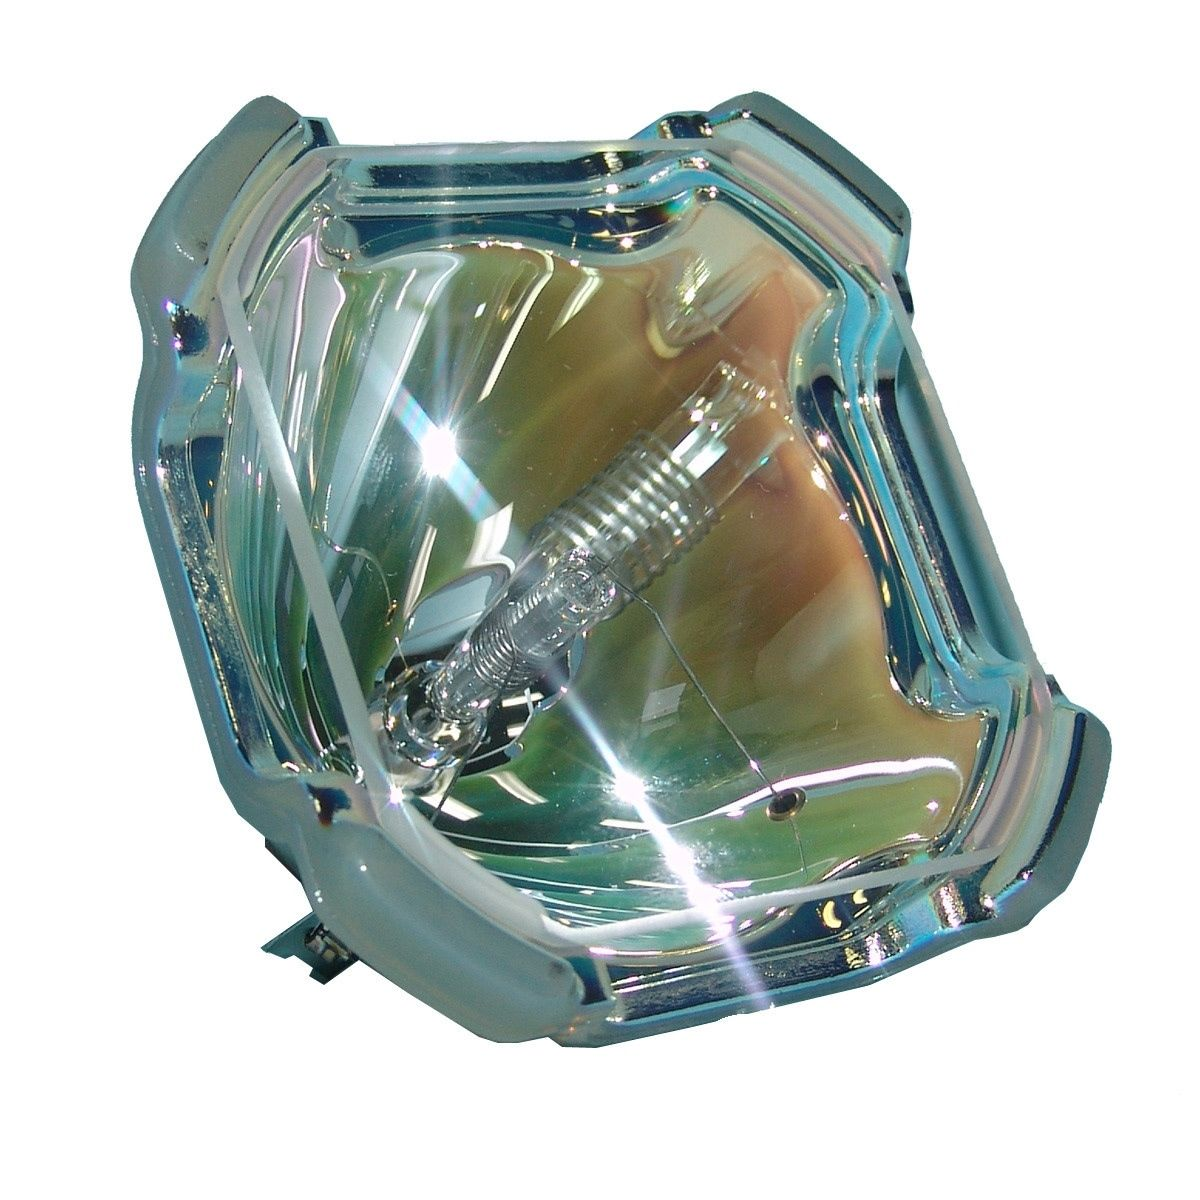 Compatible con bombilla SP-LAMP-004 para Infocus próxima DP9340/Próxima DP9440/Próxima DP9500/Próxima DP9550 lámpara para proyector